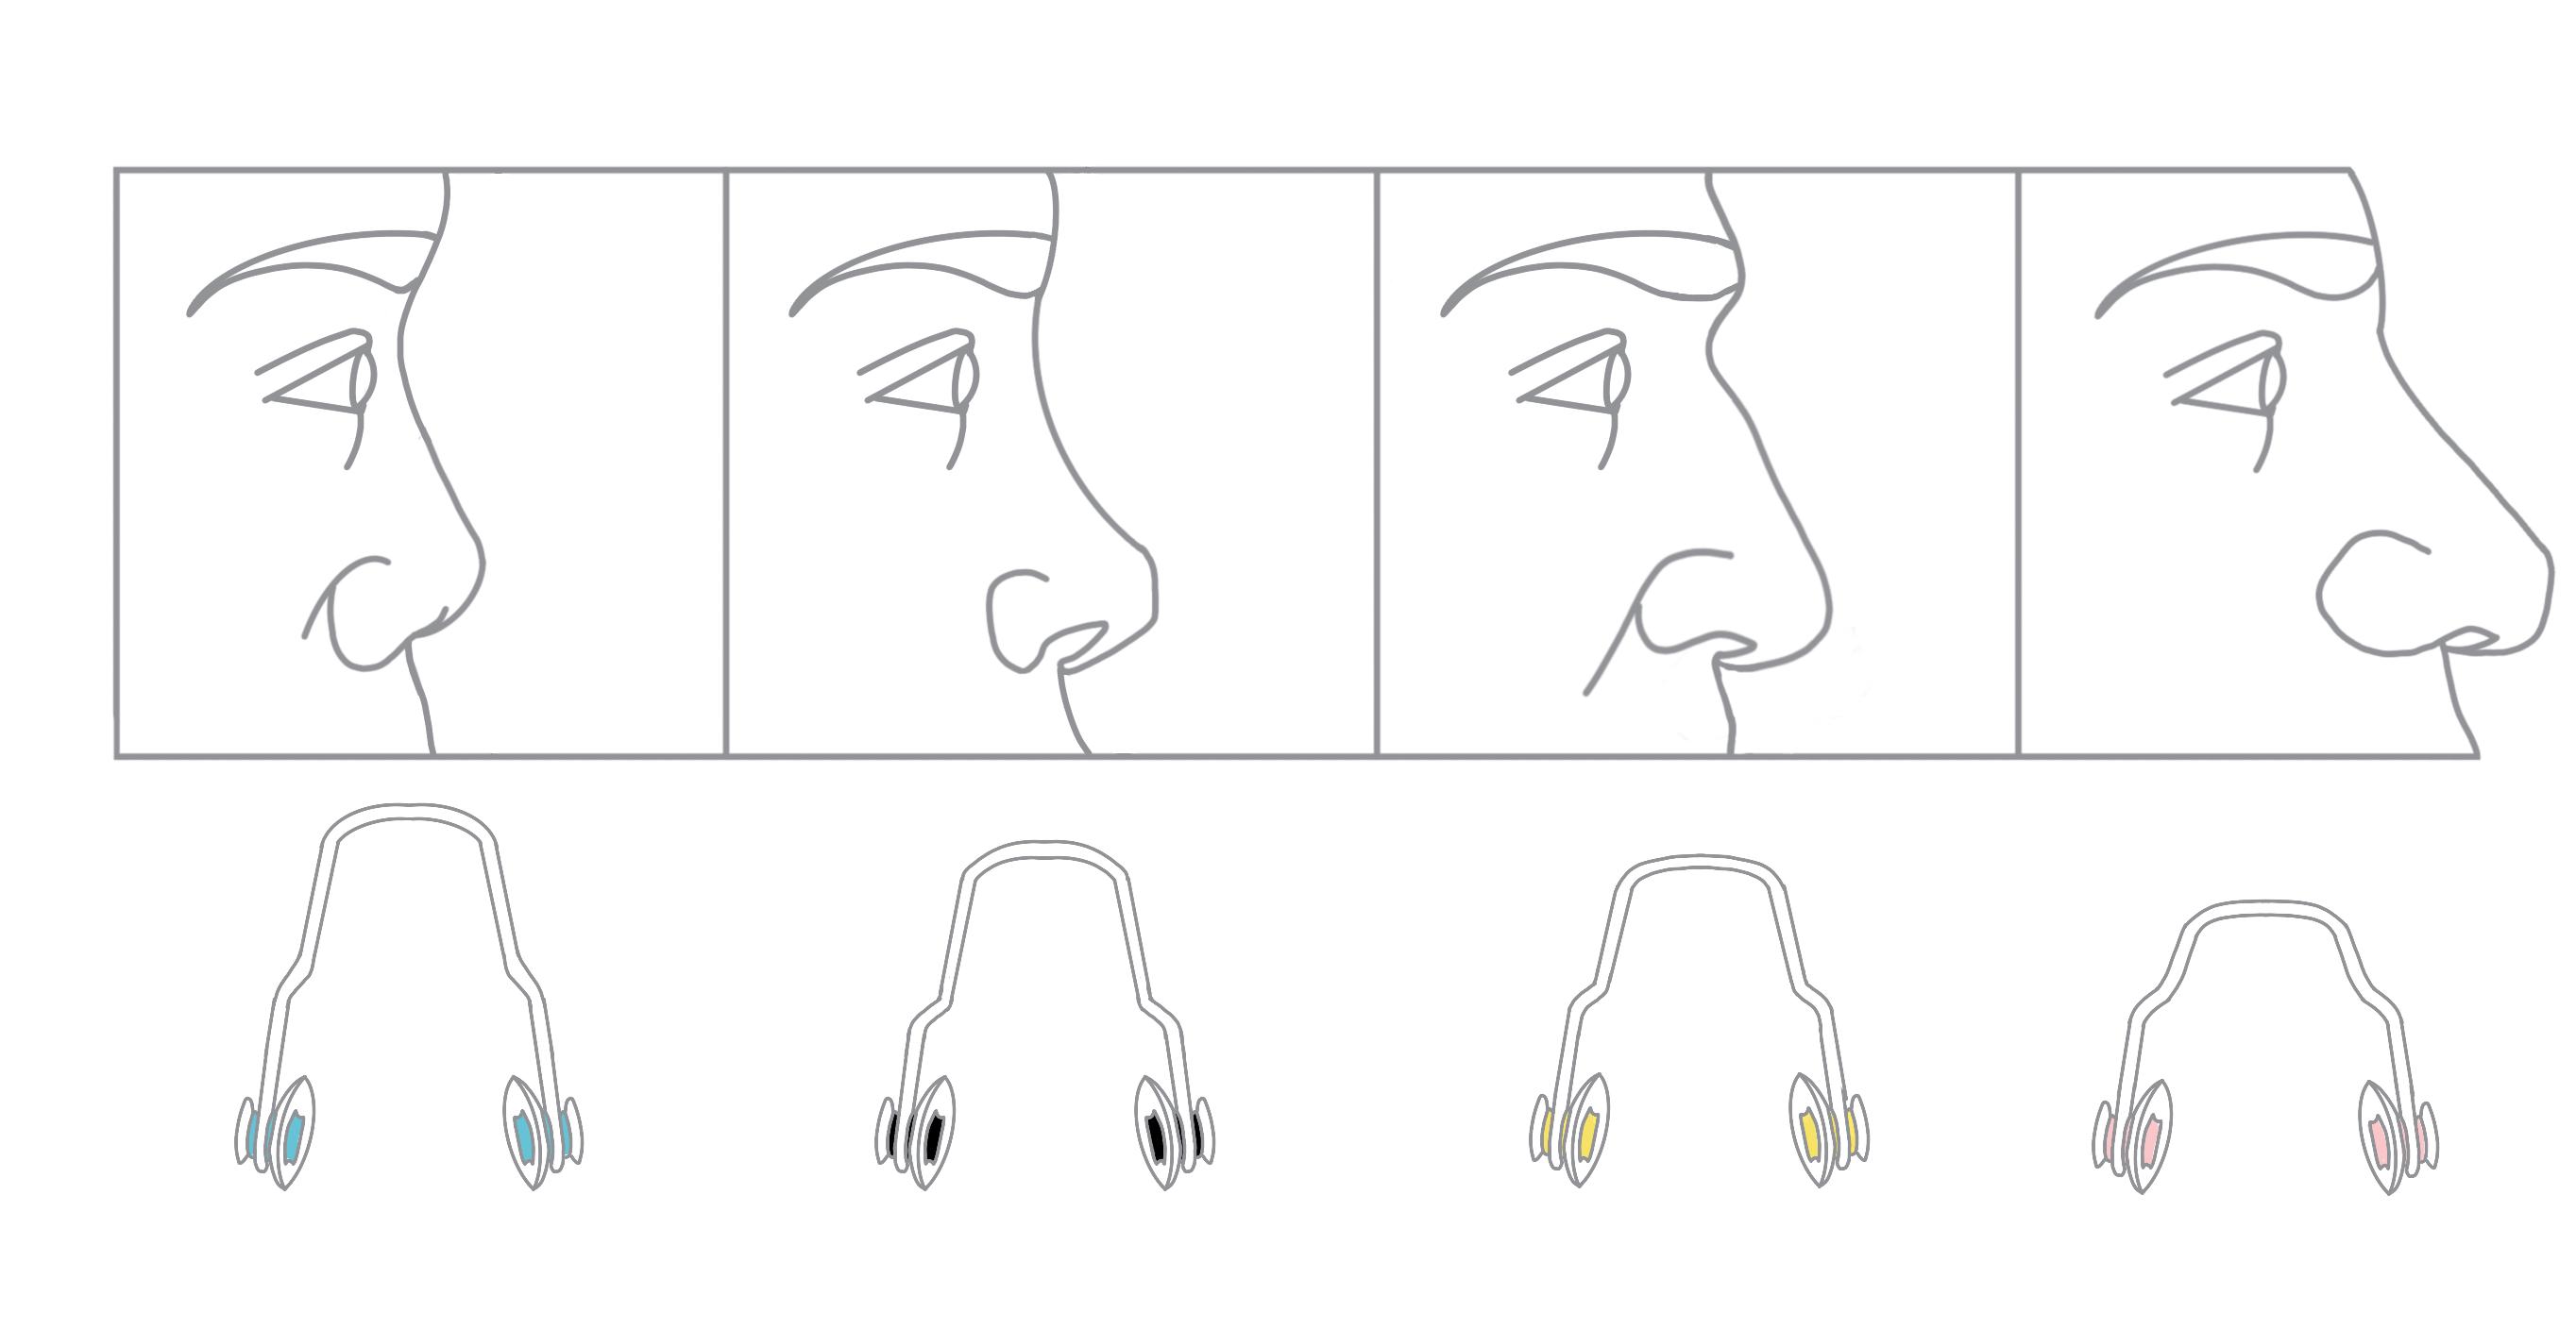 Nosepiece-nose general trend